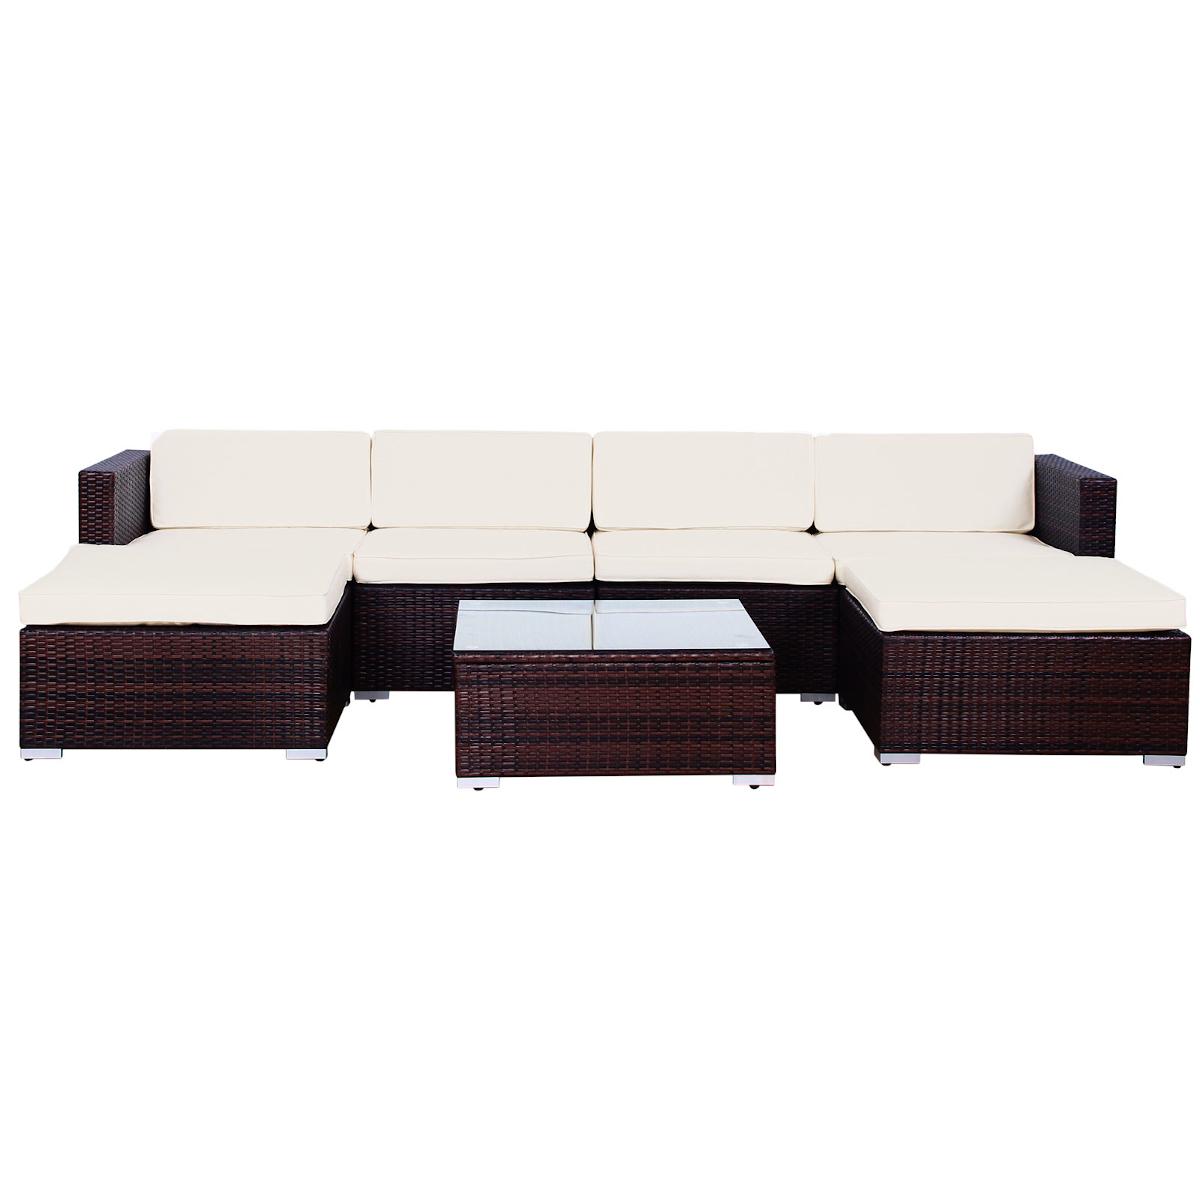 90947 SVITA LUGANO Poly Rattan Lounge XXL braun